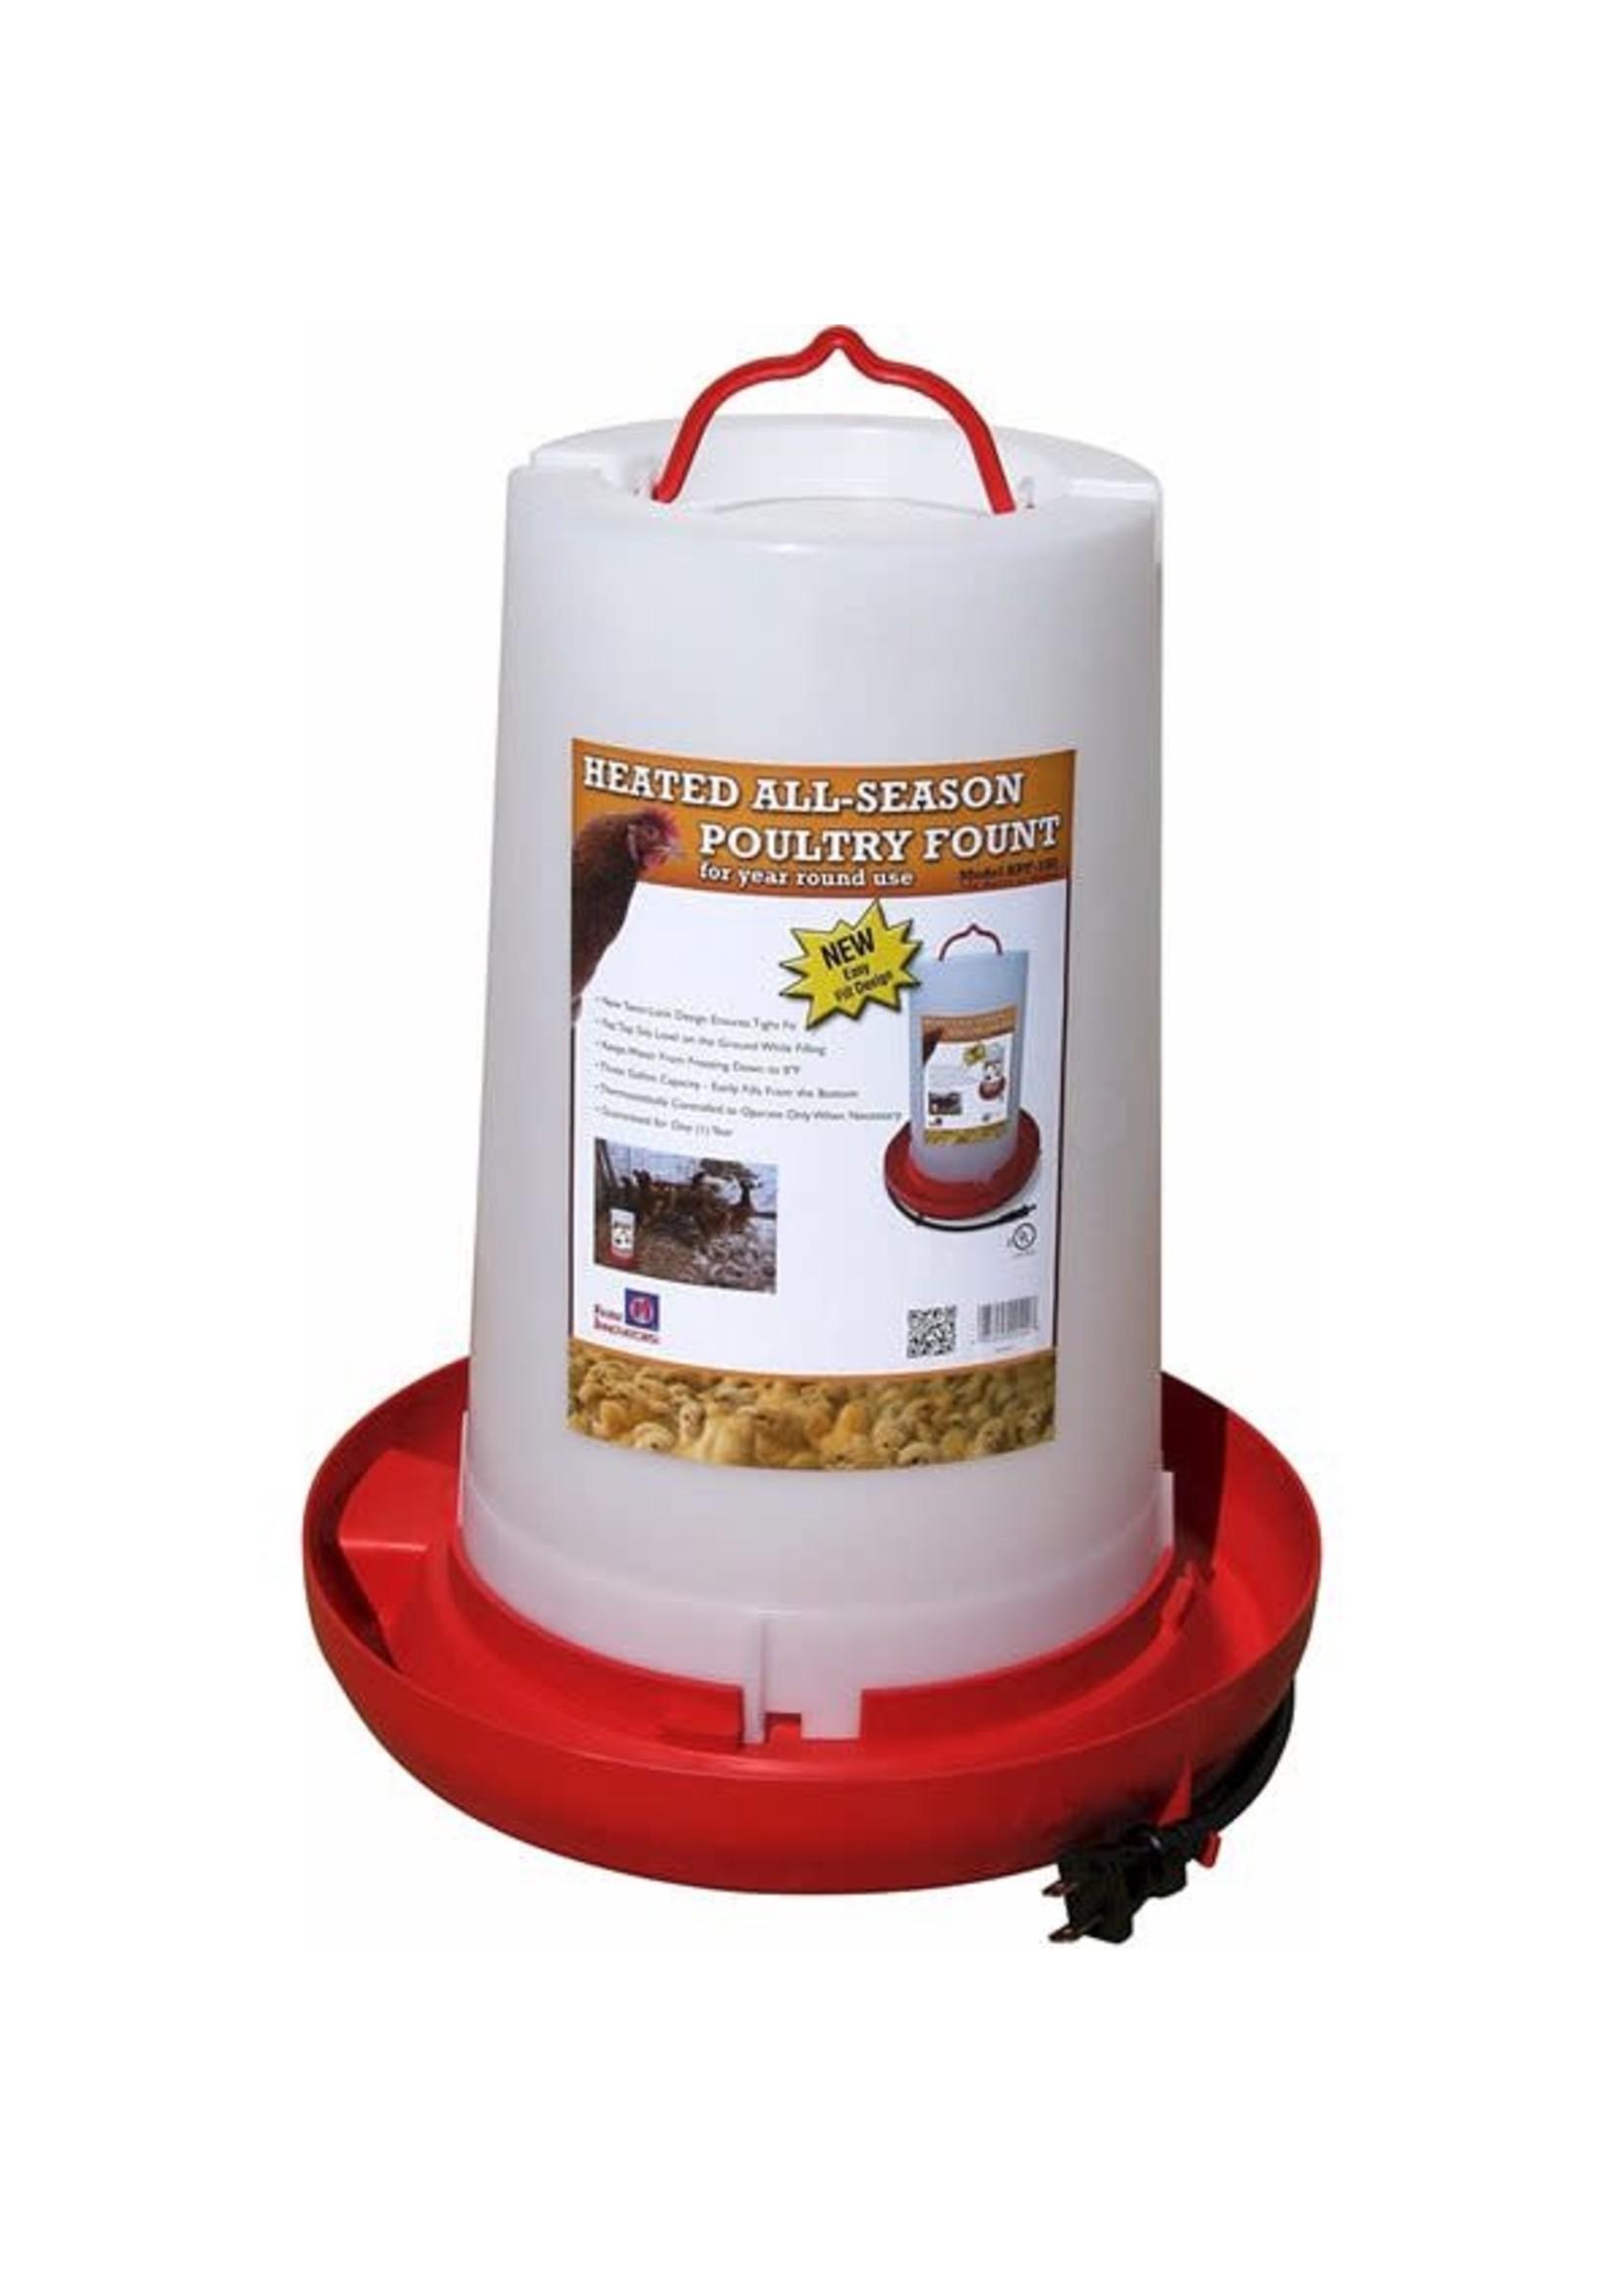 Farm Innovators Abreuvoir chauffant 3 gallons, RC